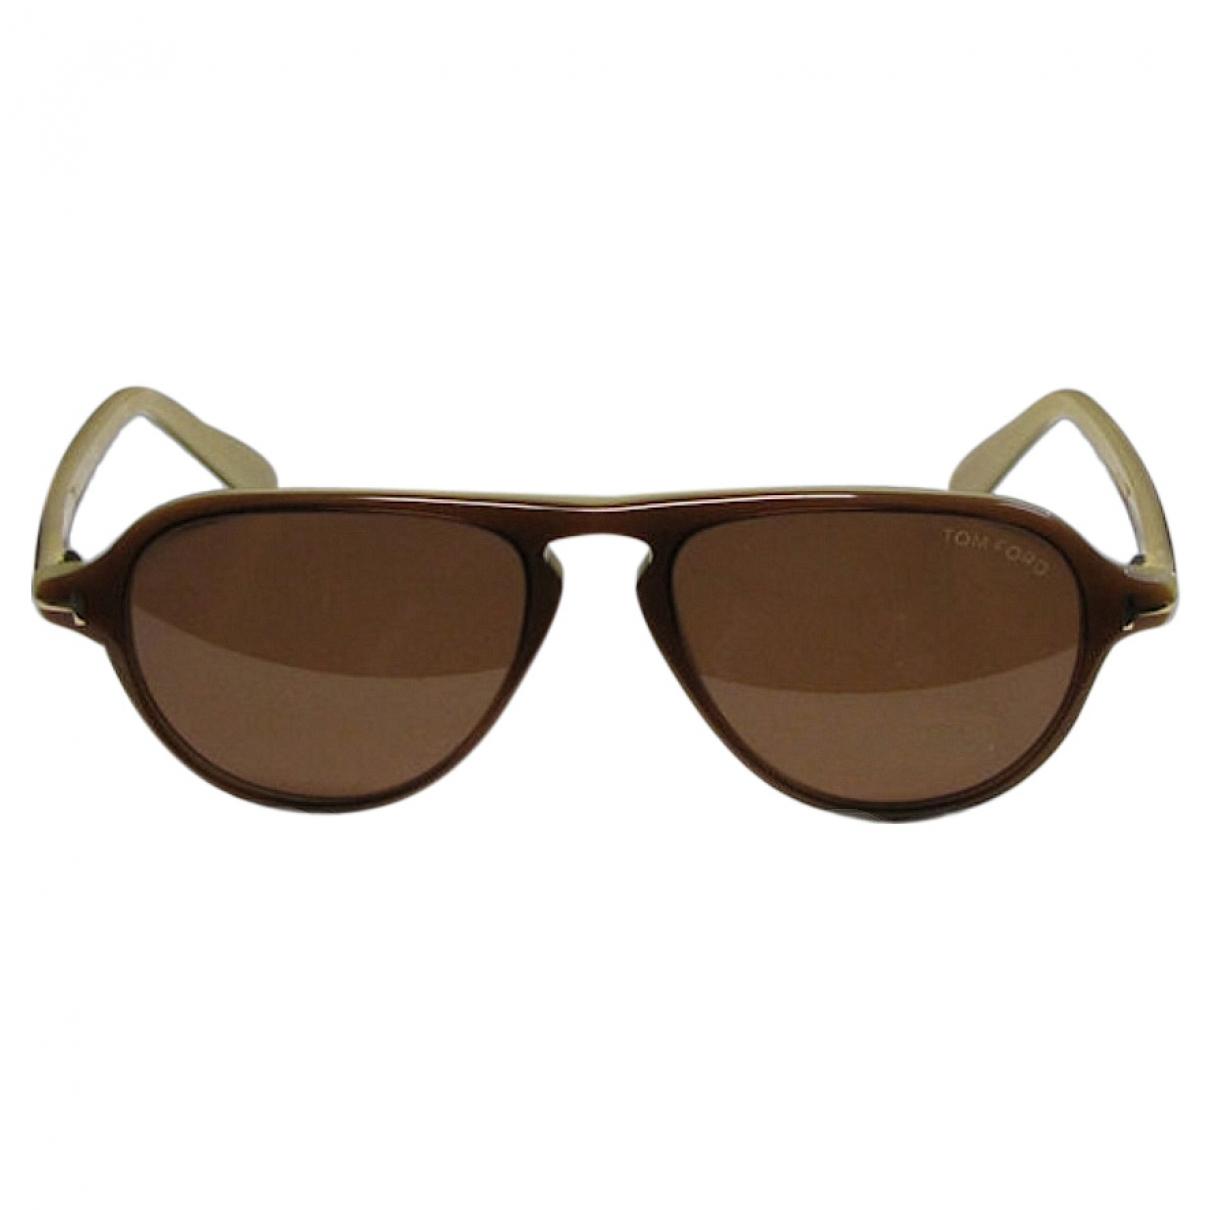 Tom Ford \N Brown Sunglasses for Women \N